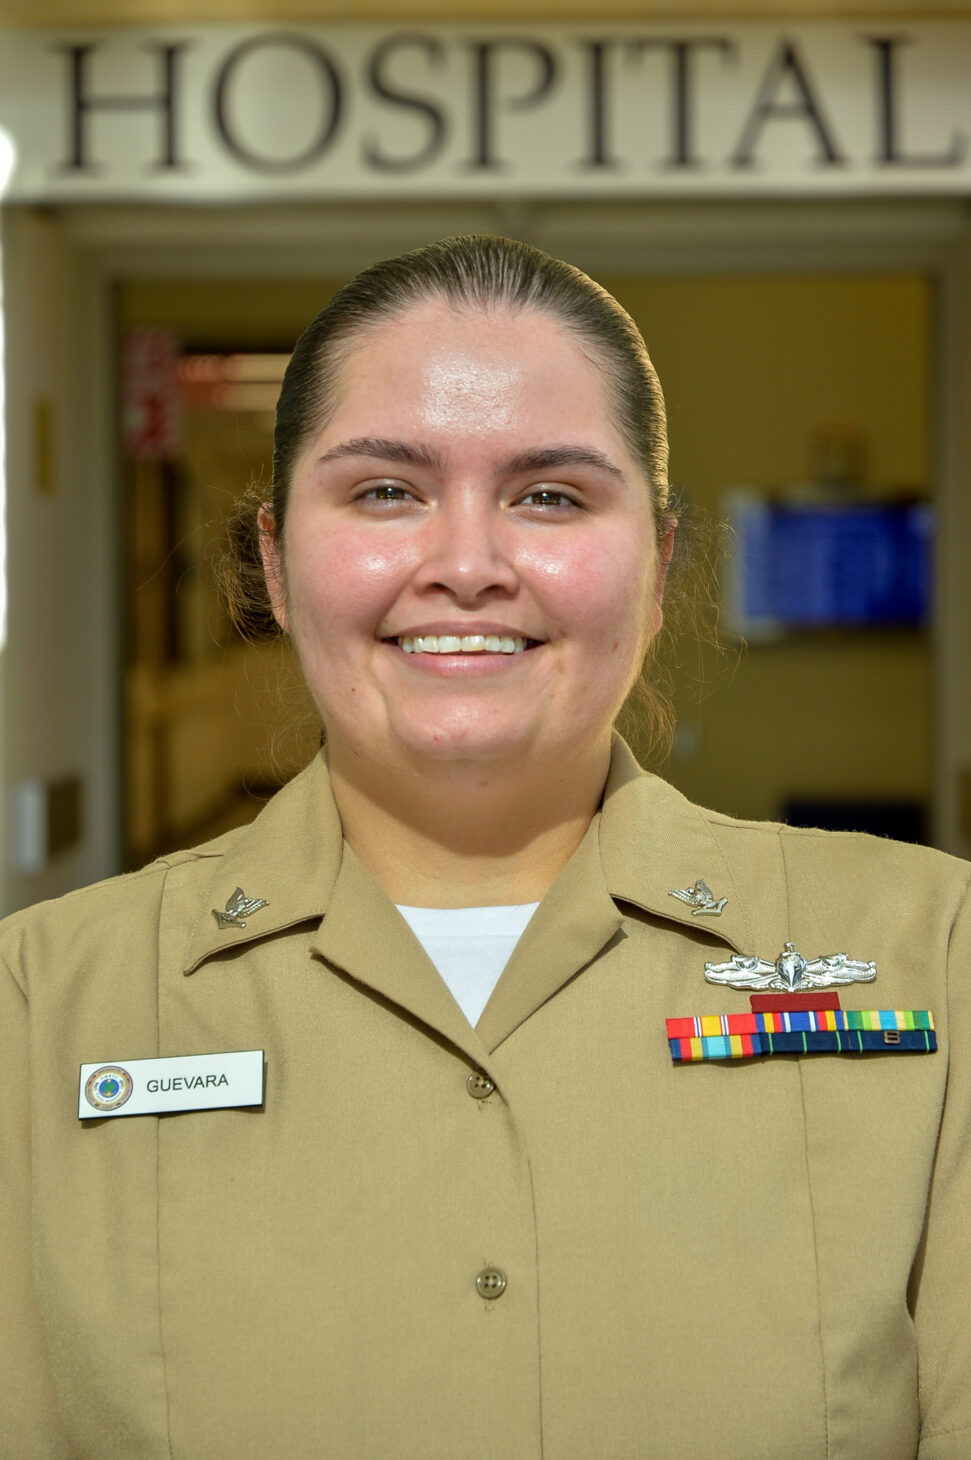 Rachel Guevara | Navy – photo courtesy of Navy Office of Community Outreach